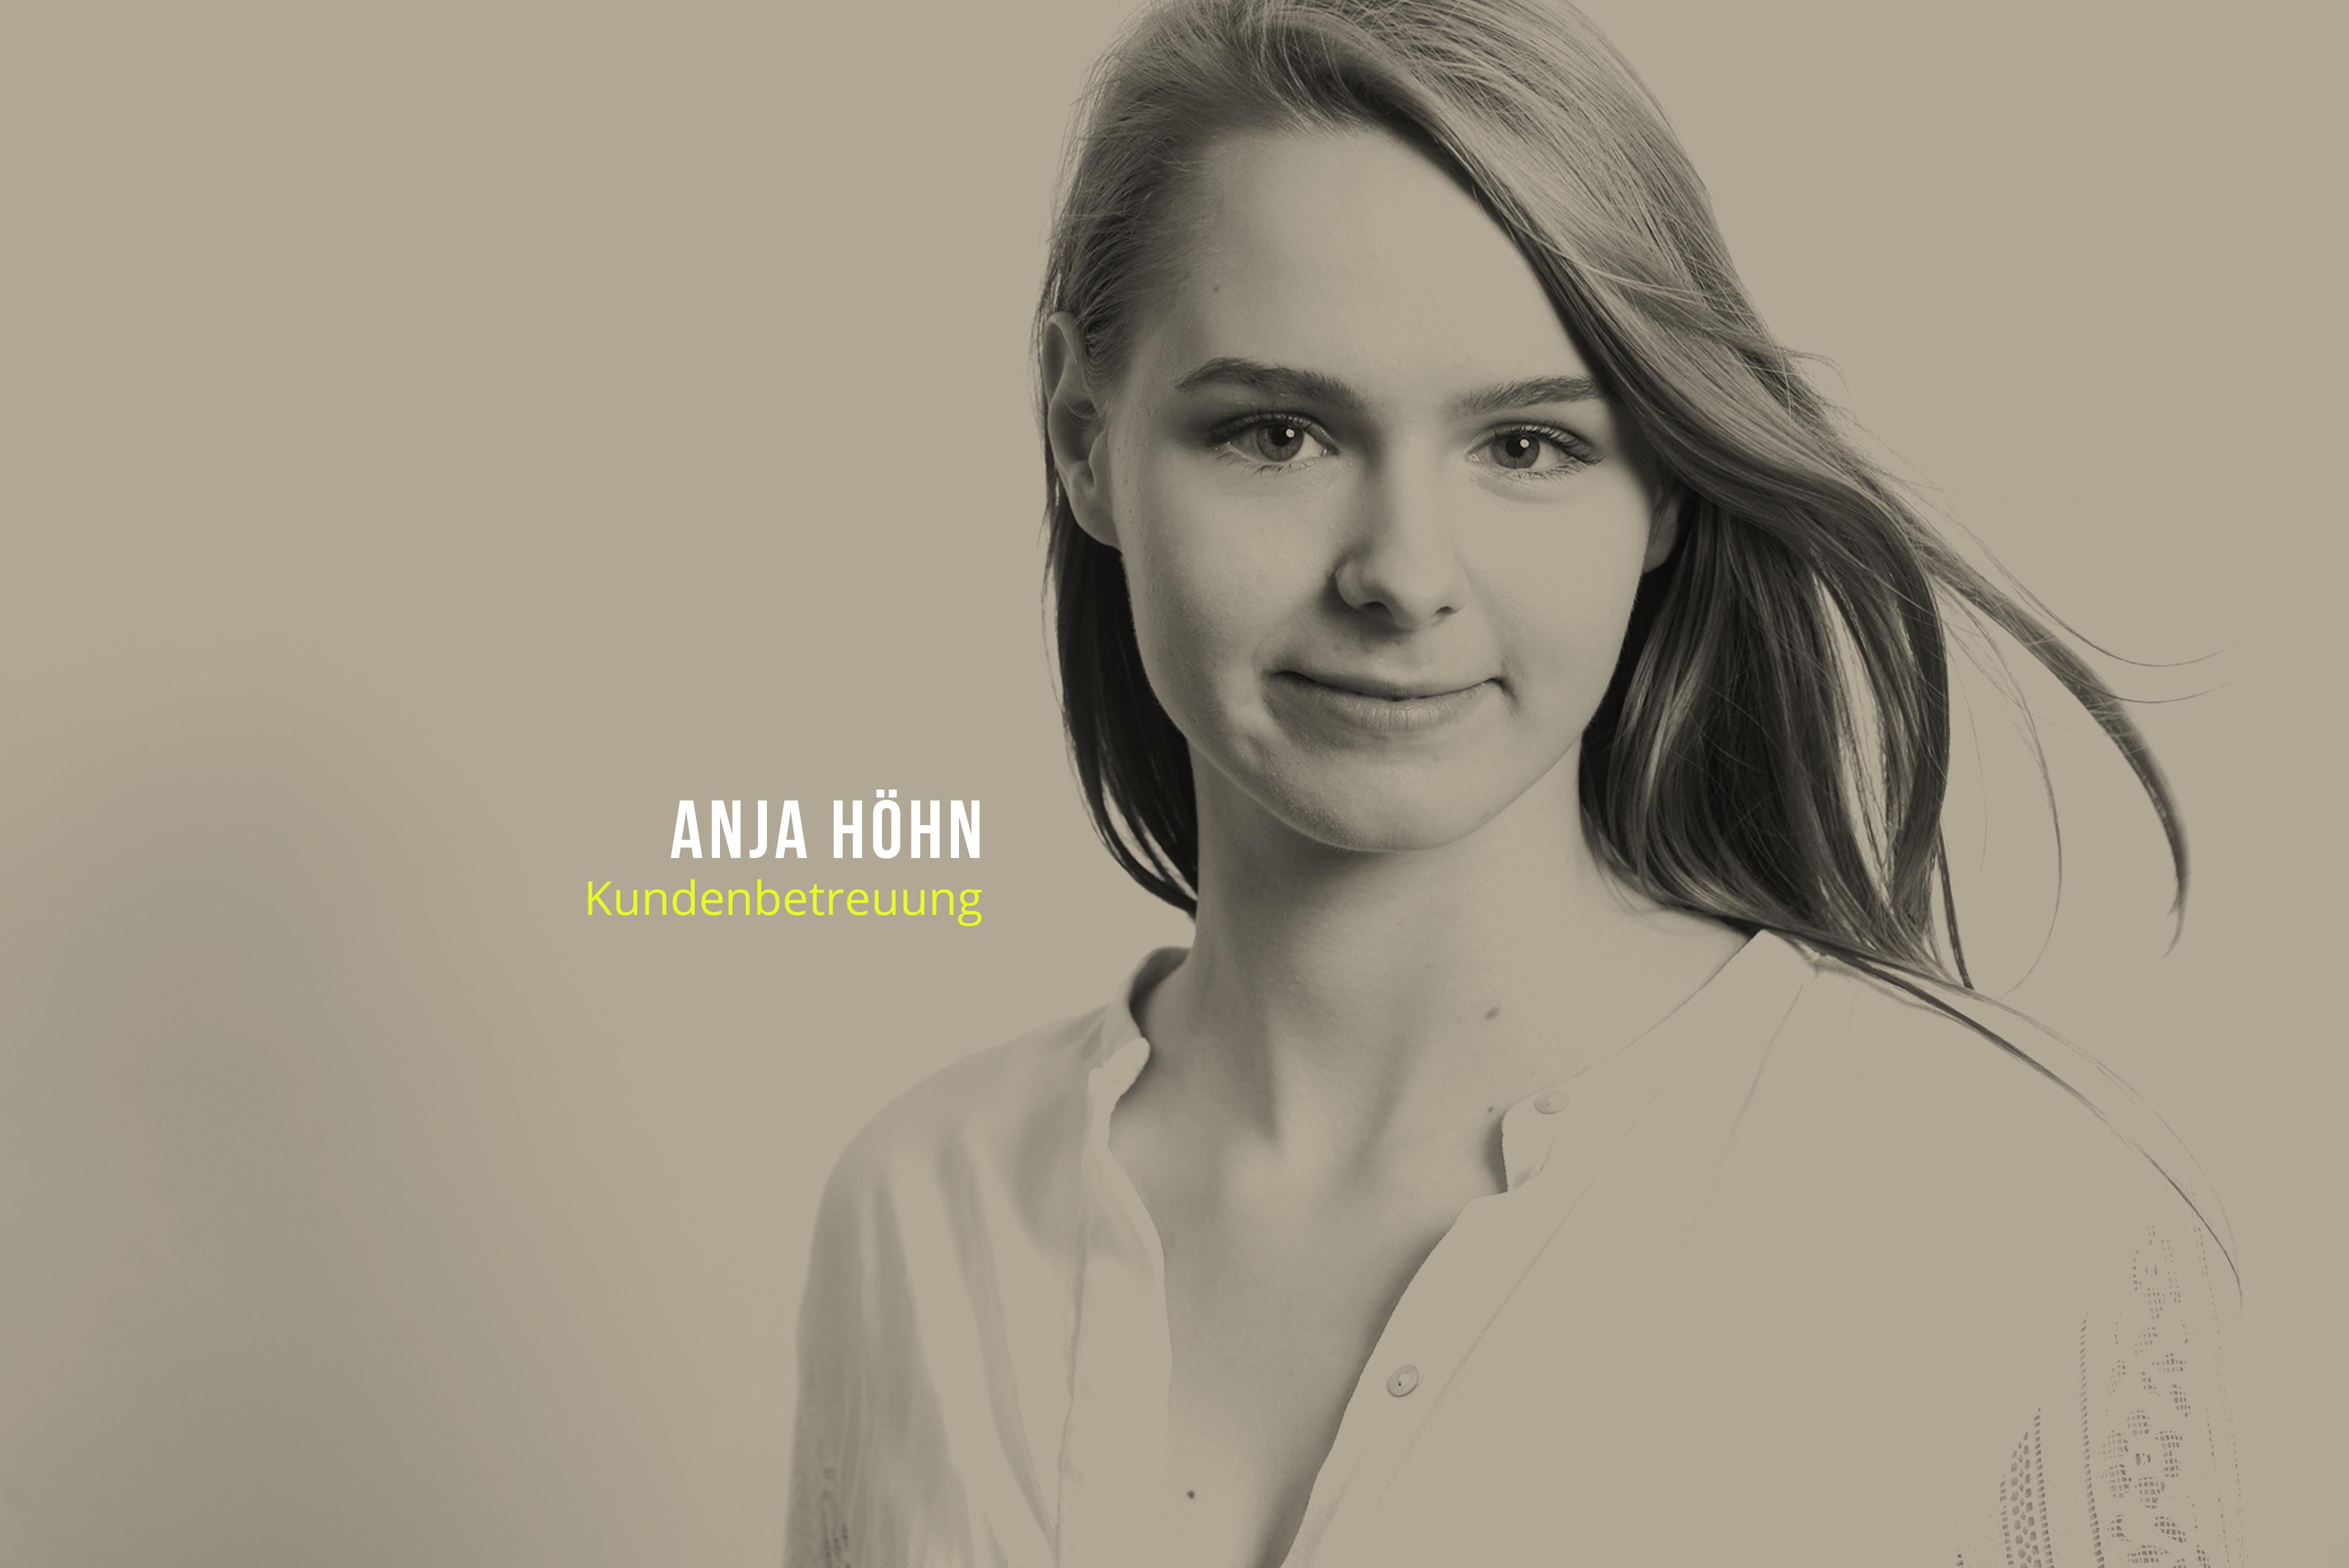 Anja Höhn Kundenbetreuung